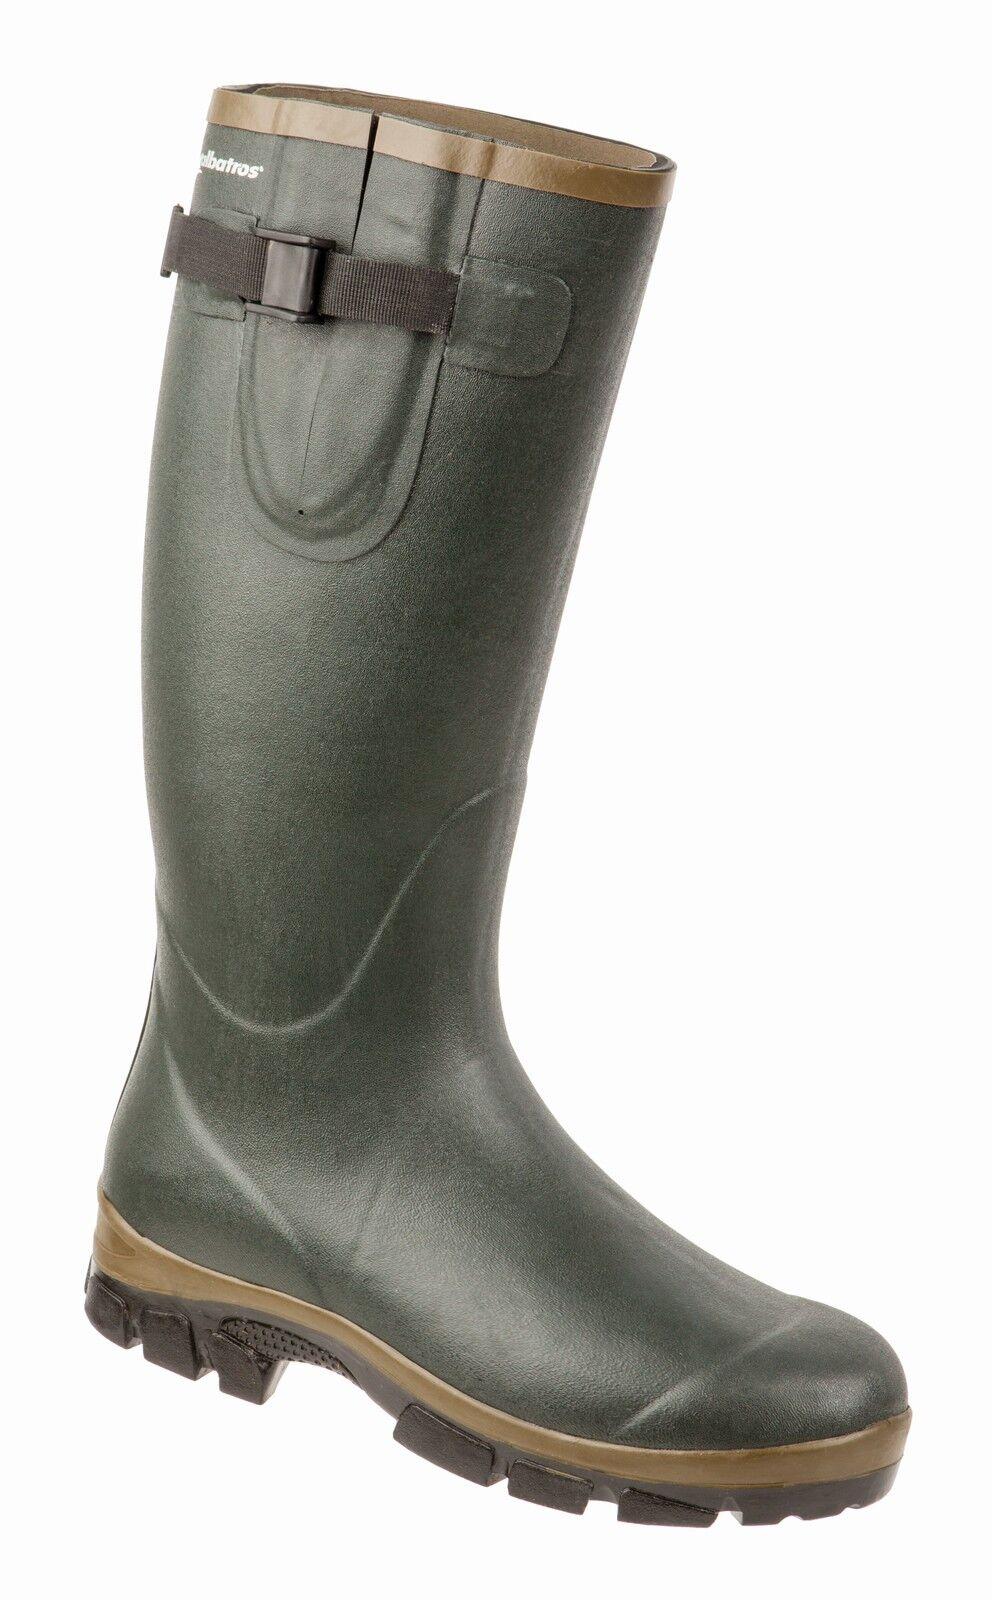 ALBATROS    Forest ISO Stiefel 575530 grün Neoprenstiefel Jagdstiefel Gummistiefel f4b41b